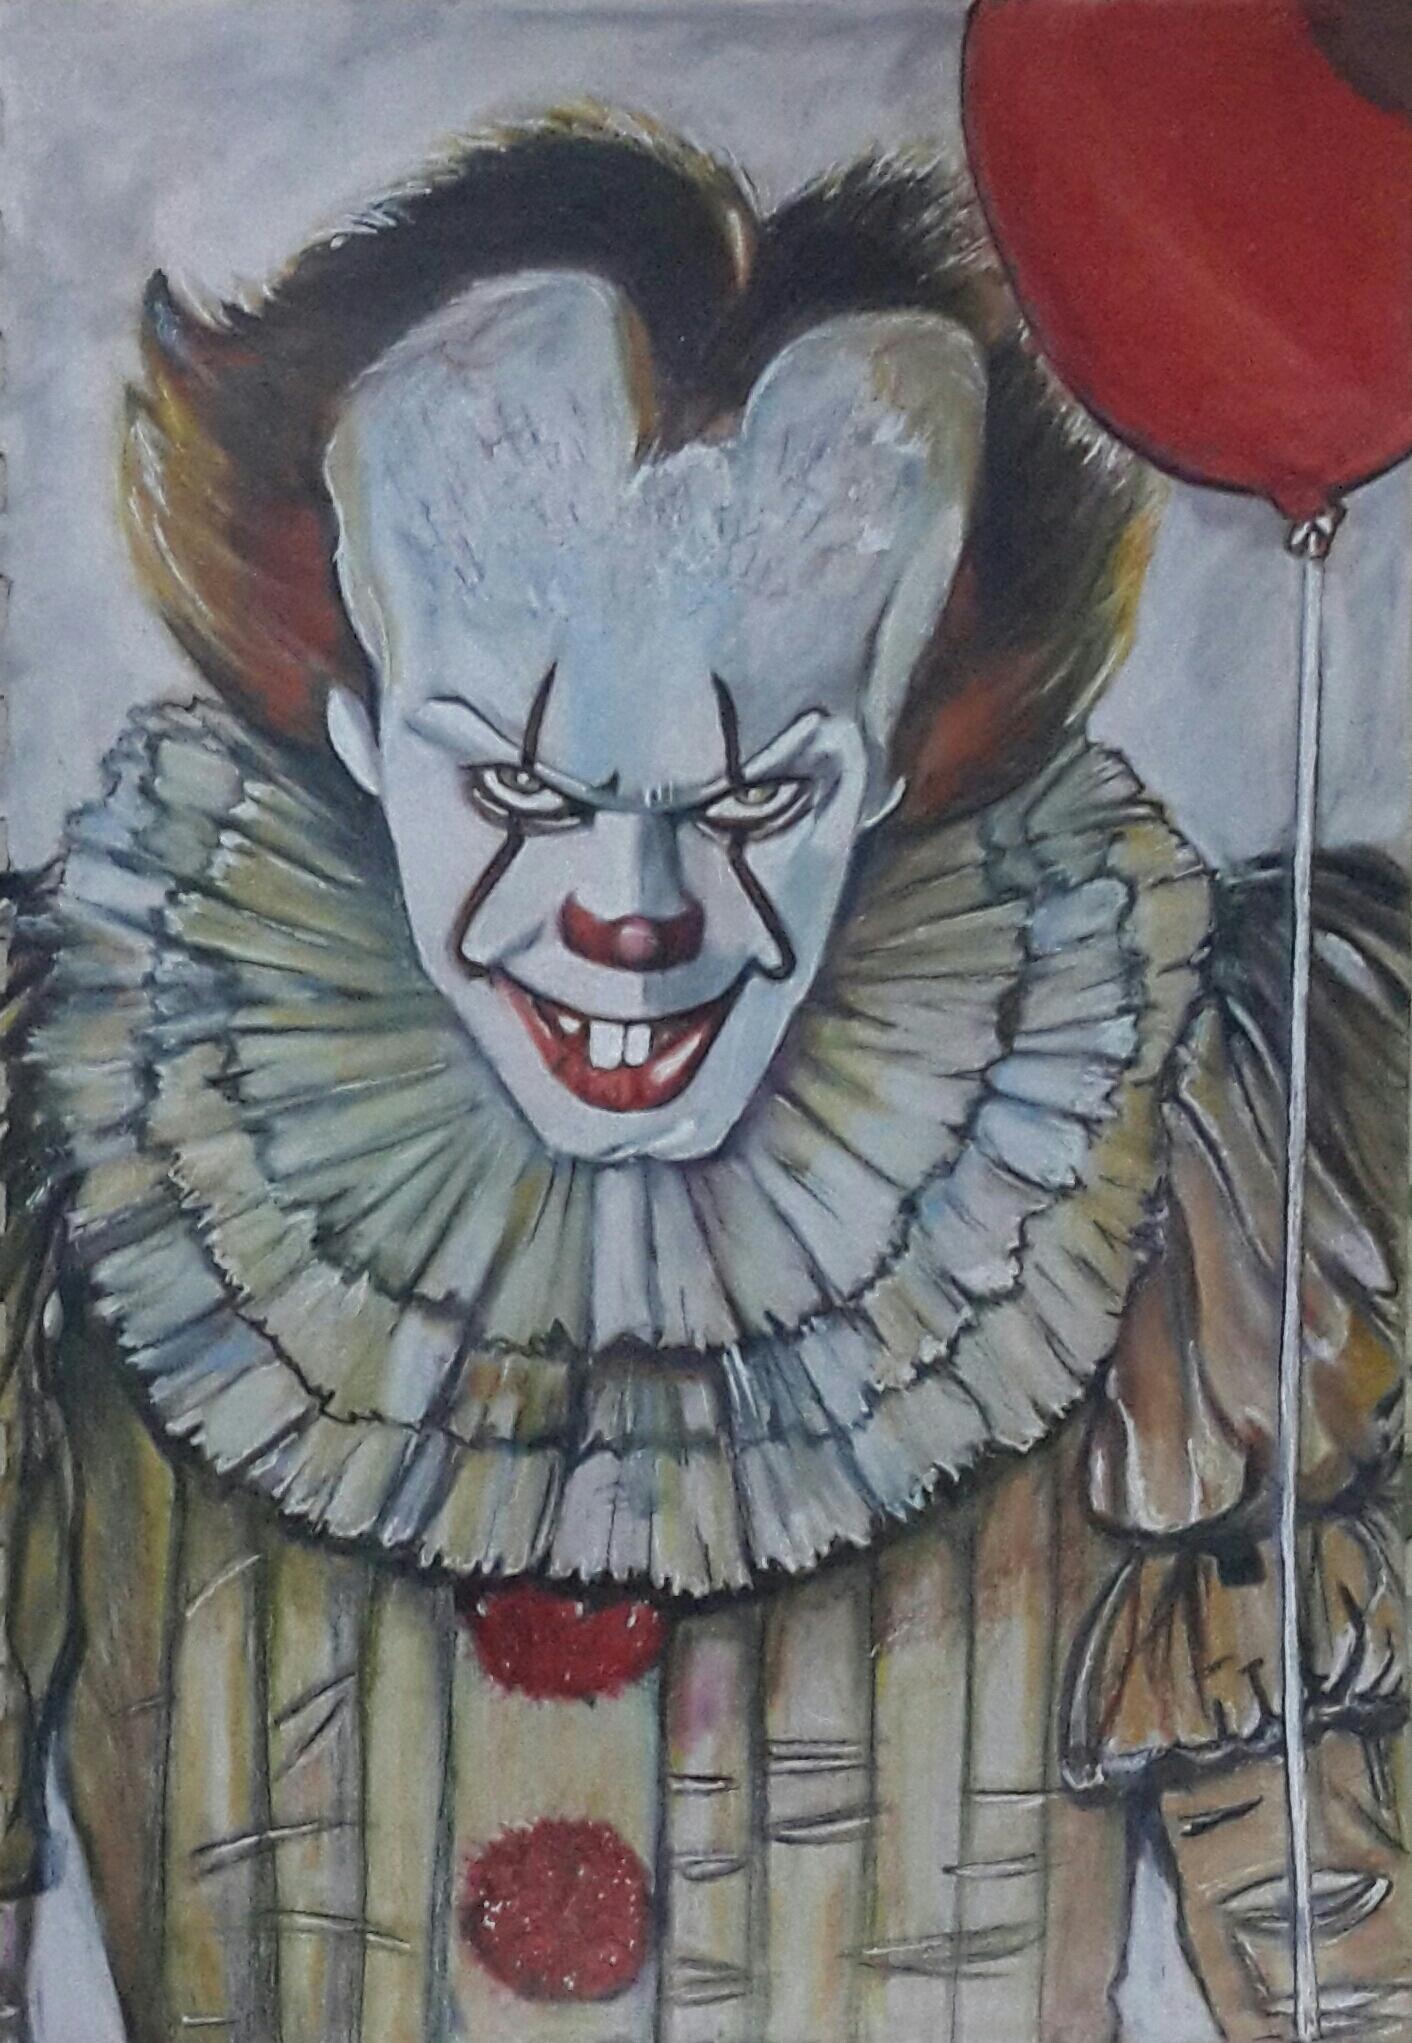 IT - Pennywise The Dancing Clown Illustration Art | vickysalvi10 | Foundmyself